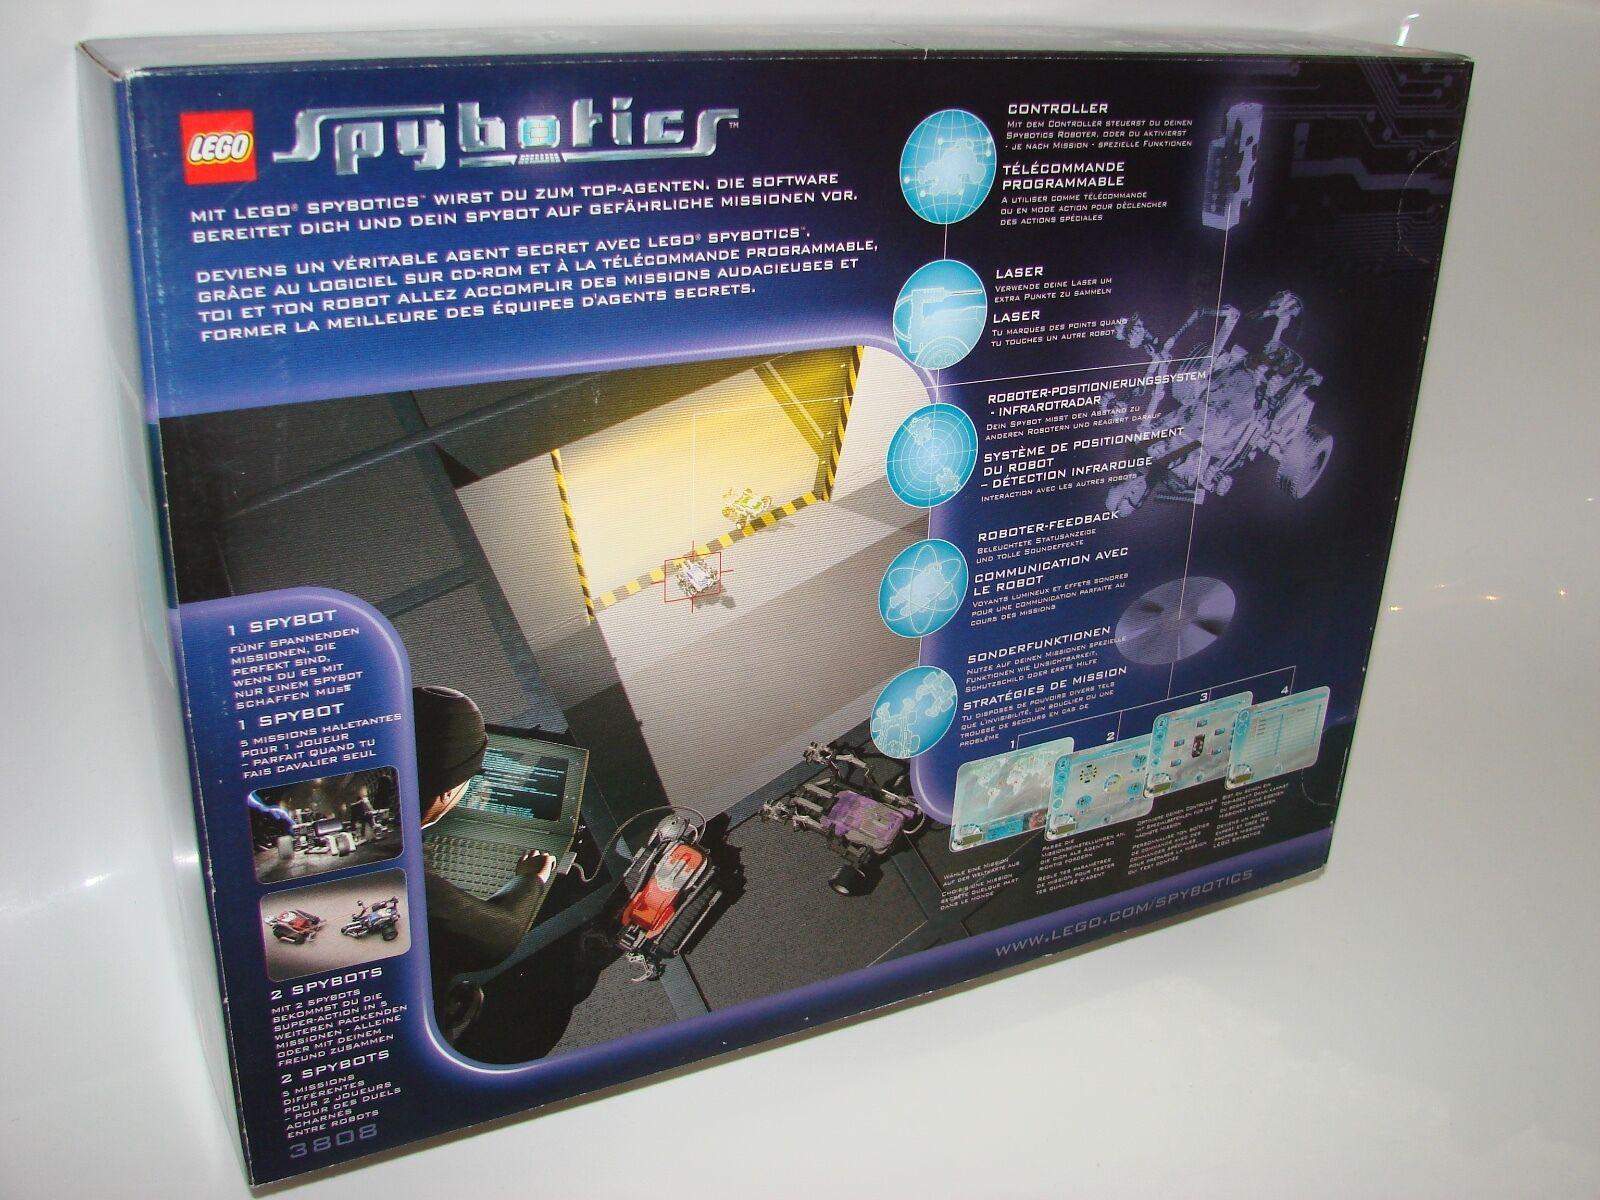 LEGO® Spybotics 3808 Shadowstrike S70 NEU OVP NEW MISB MISB MISB NRFB 29bbf7